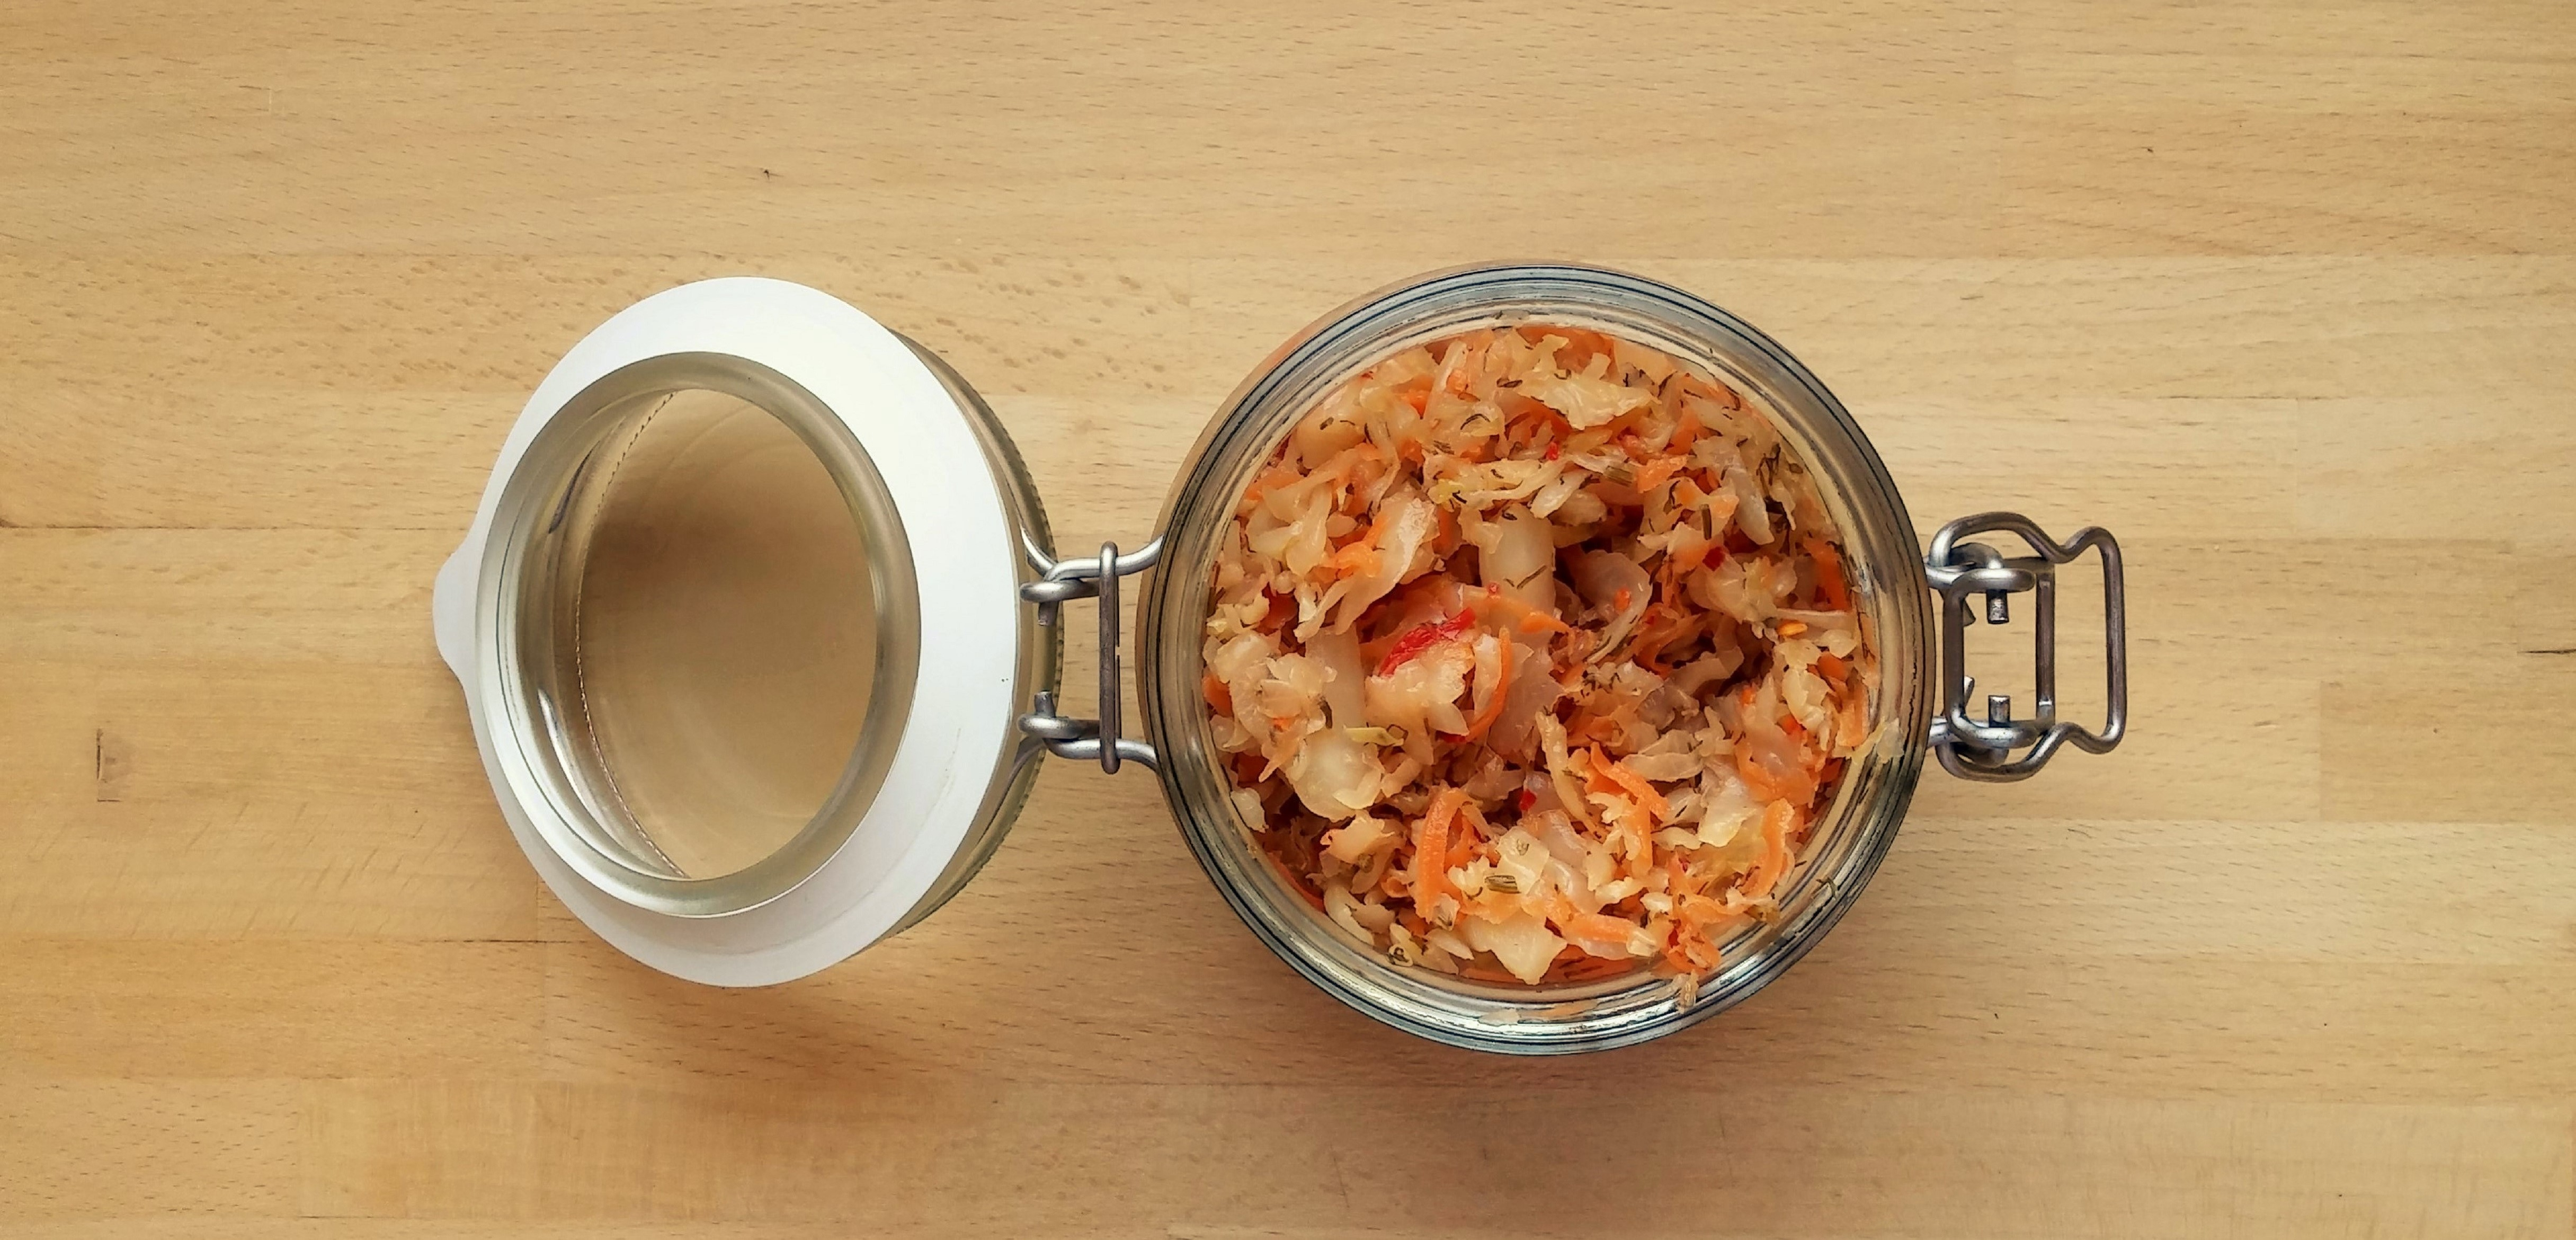 Spicy Carrot Sauerkraut